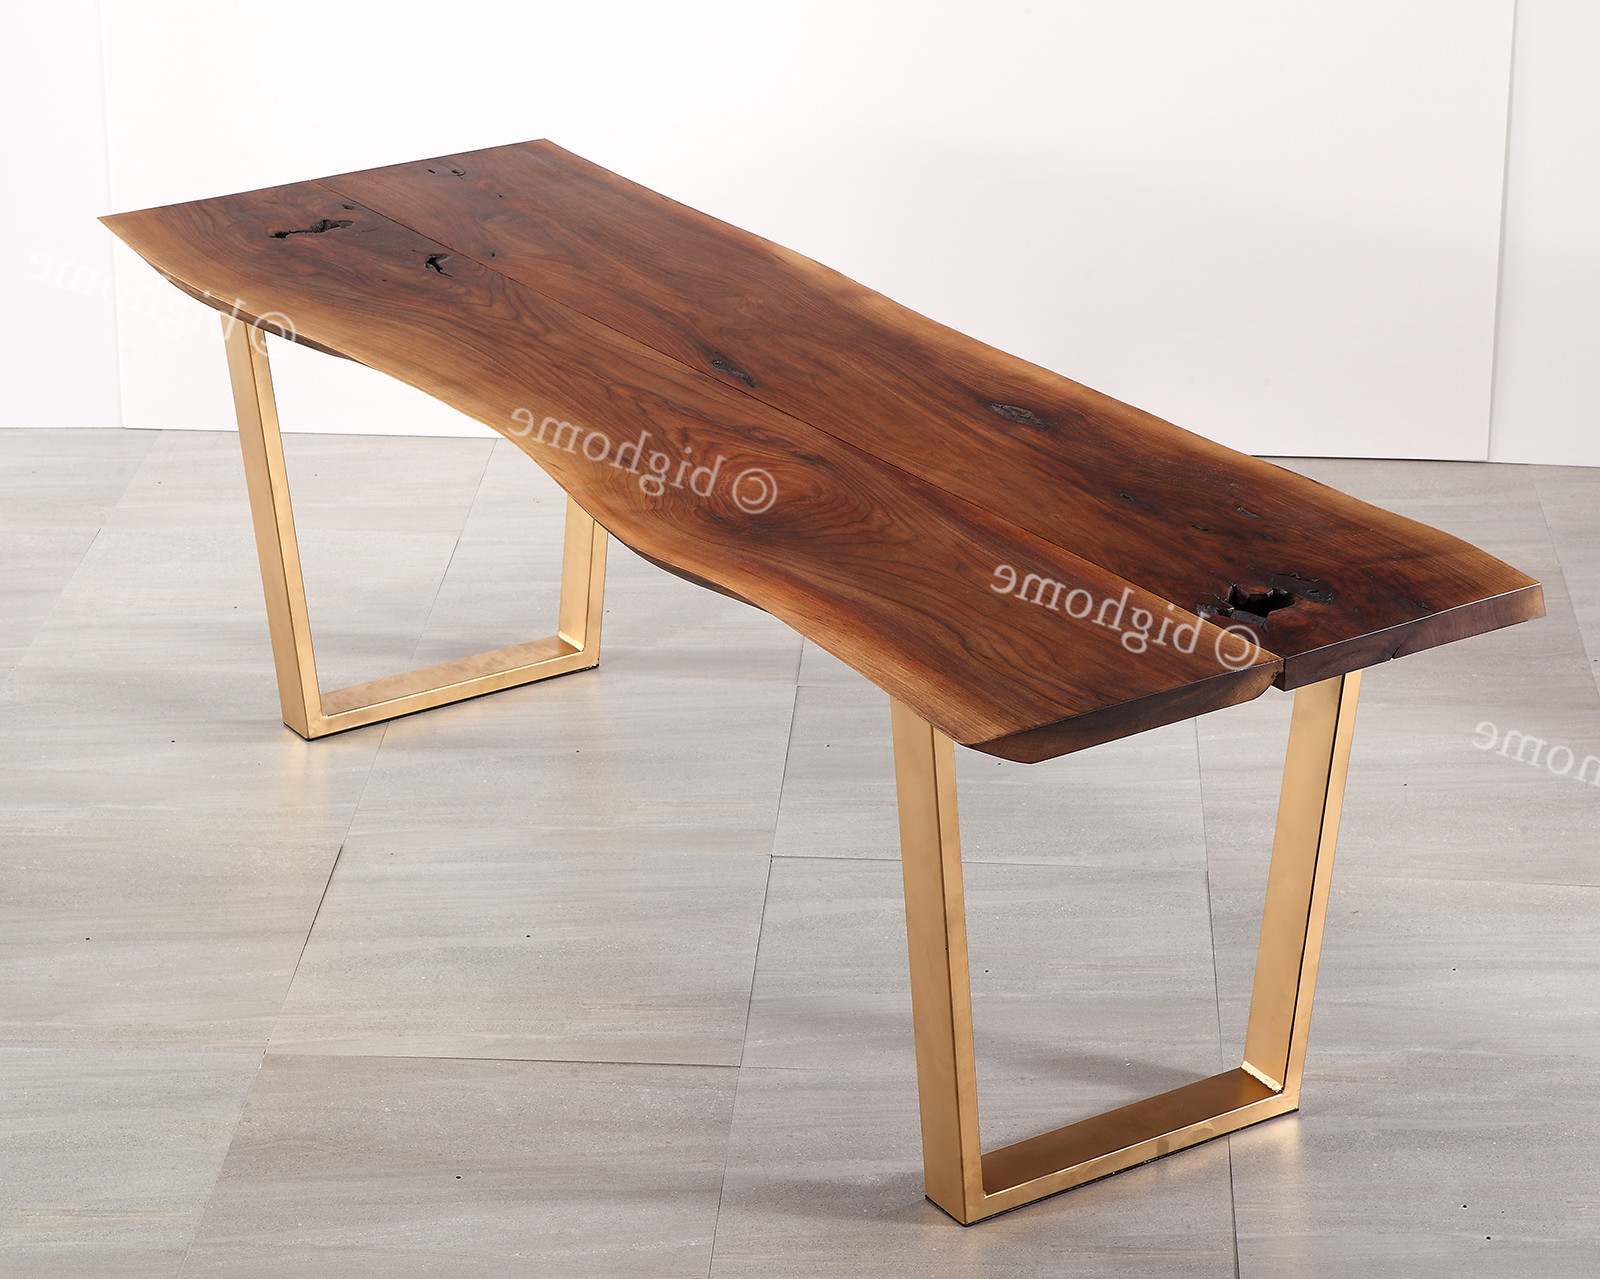 "2020 Evalline Modern Dark Walnut Coffee Tables With Living Room Modern Furniture 87"" Table Walnut Finish Wood (View 2 of 20)"